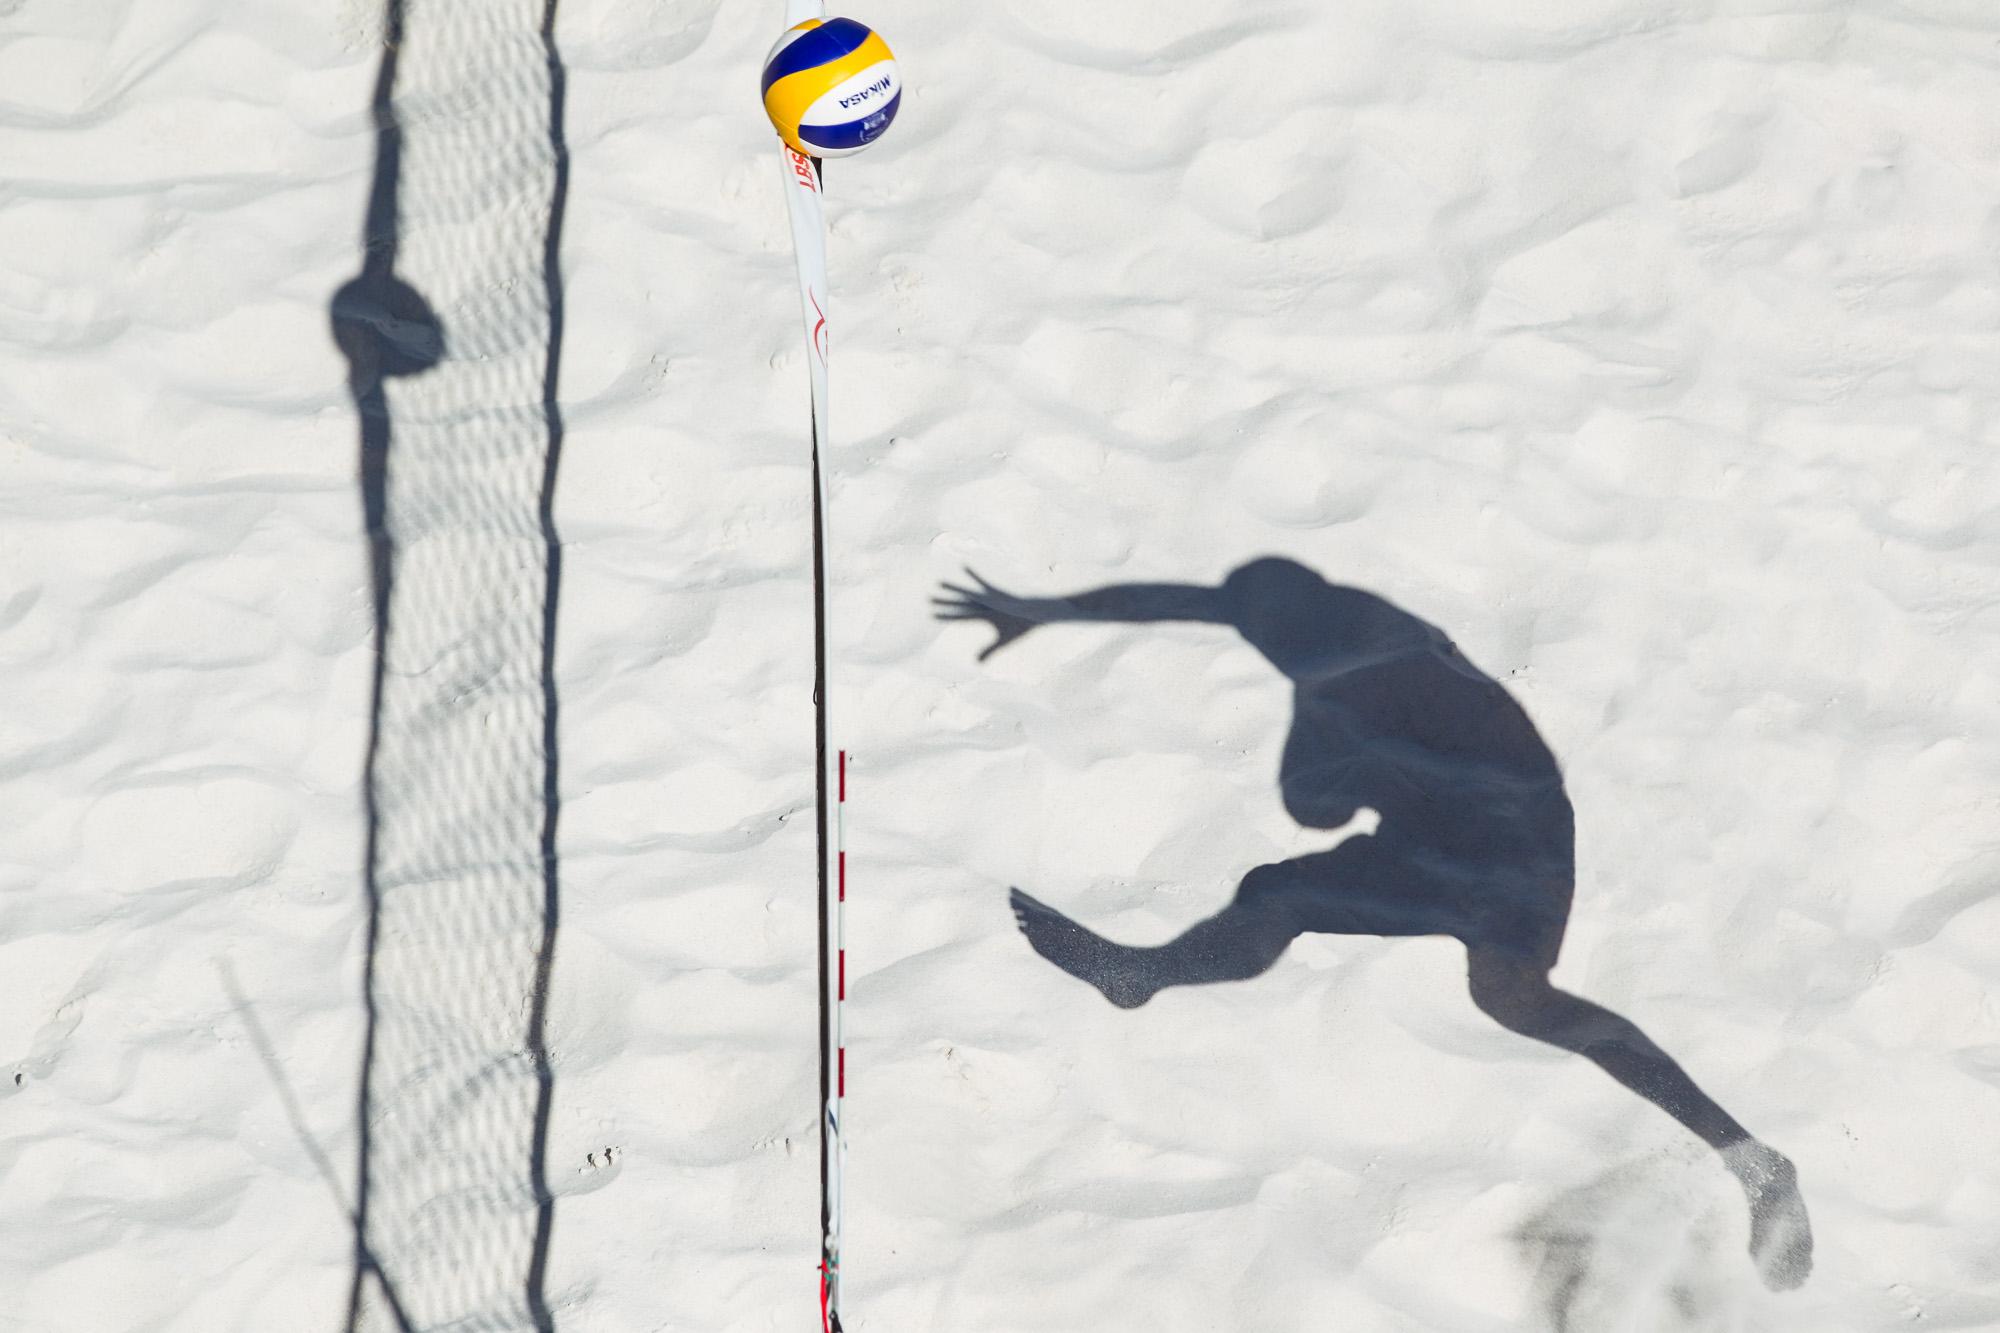 Heiko Steinkemper (USC Konstanz); LBS Cup Beachvolleyball A-City Stuttgart, Schwabenplatz, Stuttgart Germany, 20170618; Foto: Nils Wuechner/Eibner Pressefoto